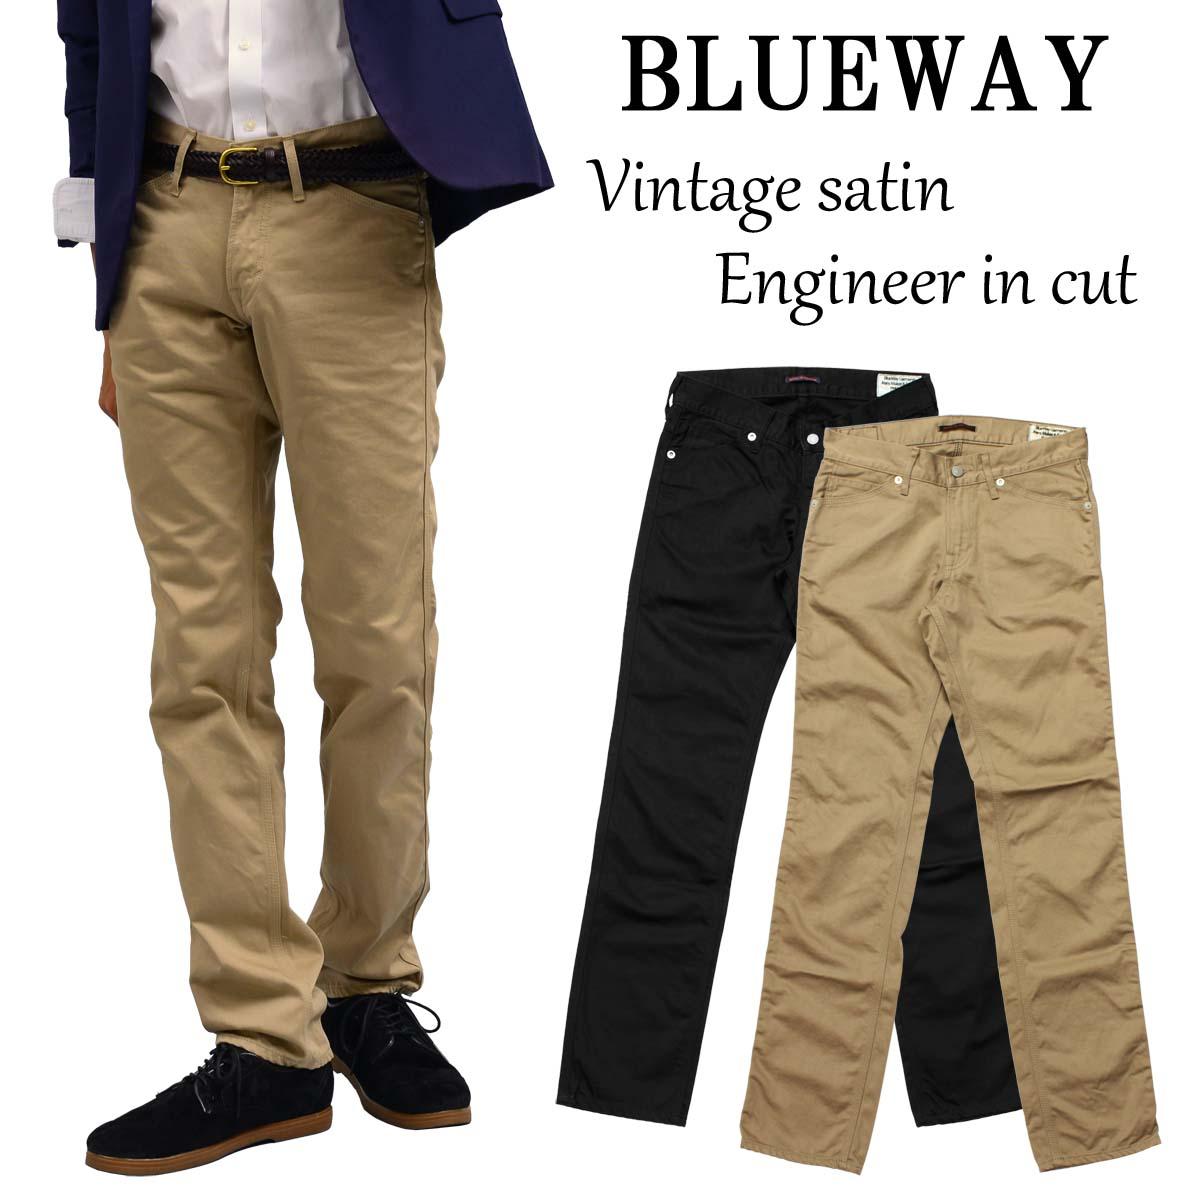 BLUEWAY:ビンテージサテン・エンジニアインカットパンツ(ワンウォッシュ):M1632 ブルーウェイ パンツ メンズ サテン チノパン 裾上げ